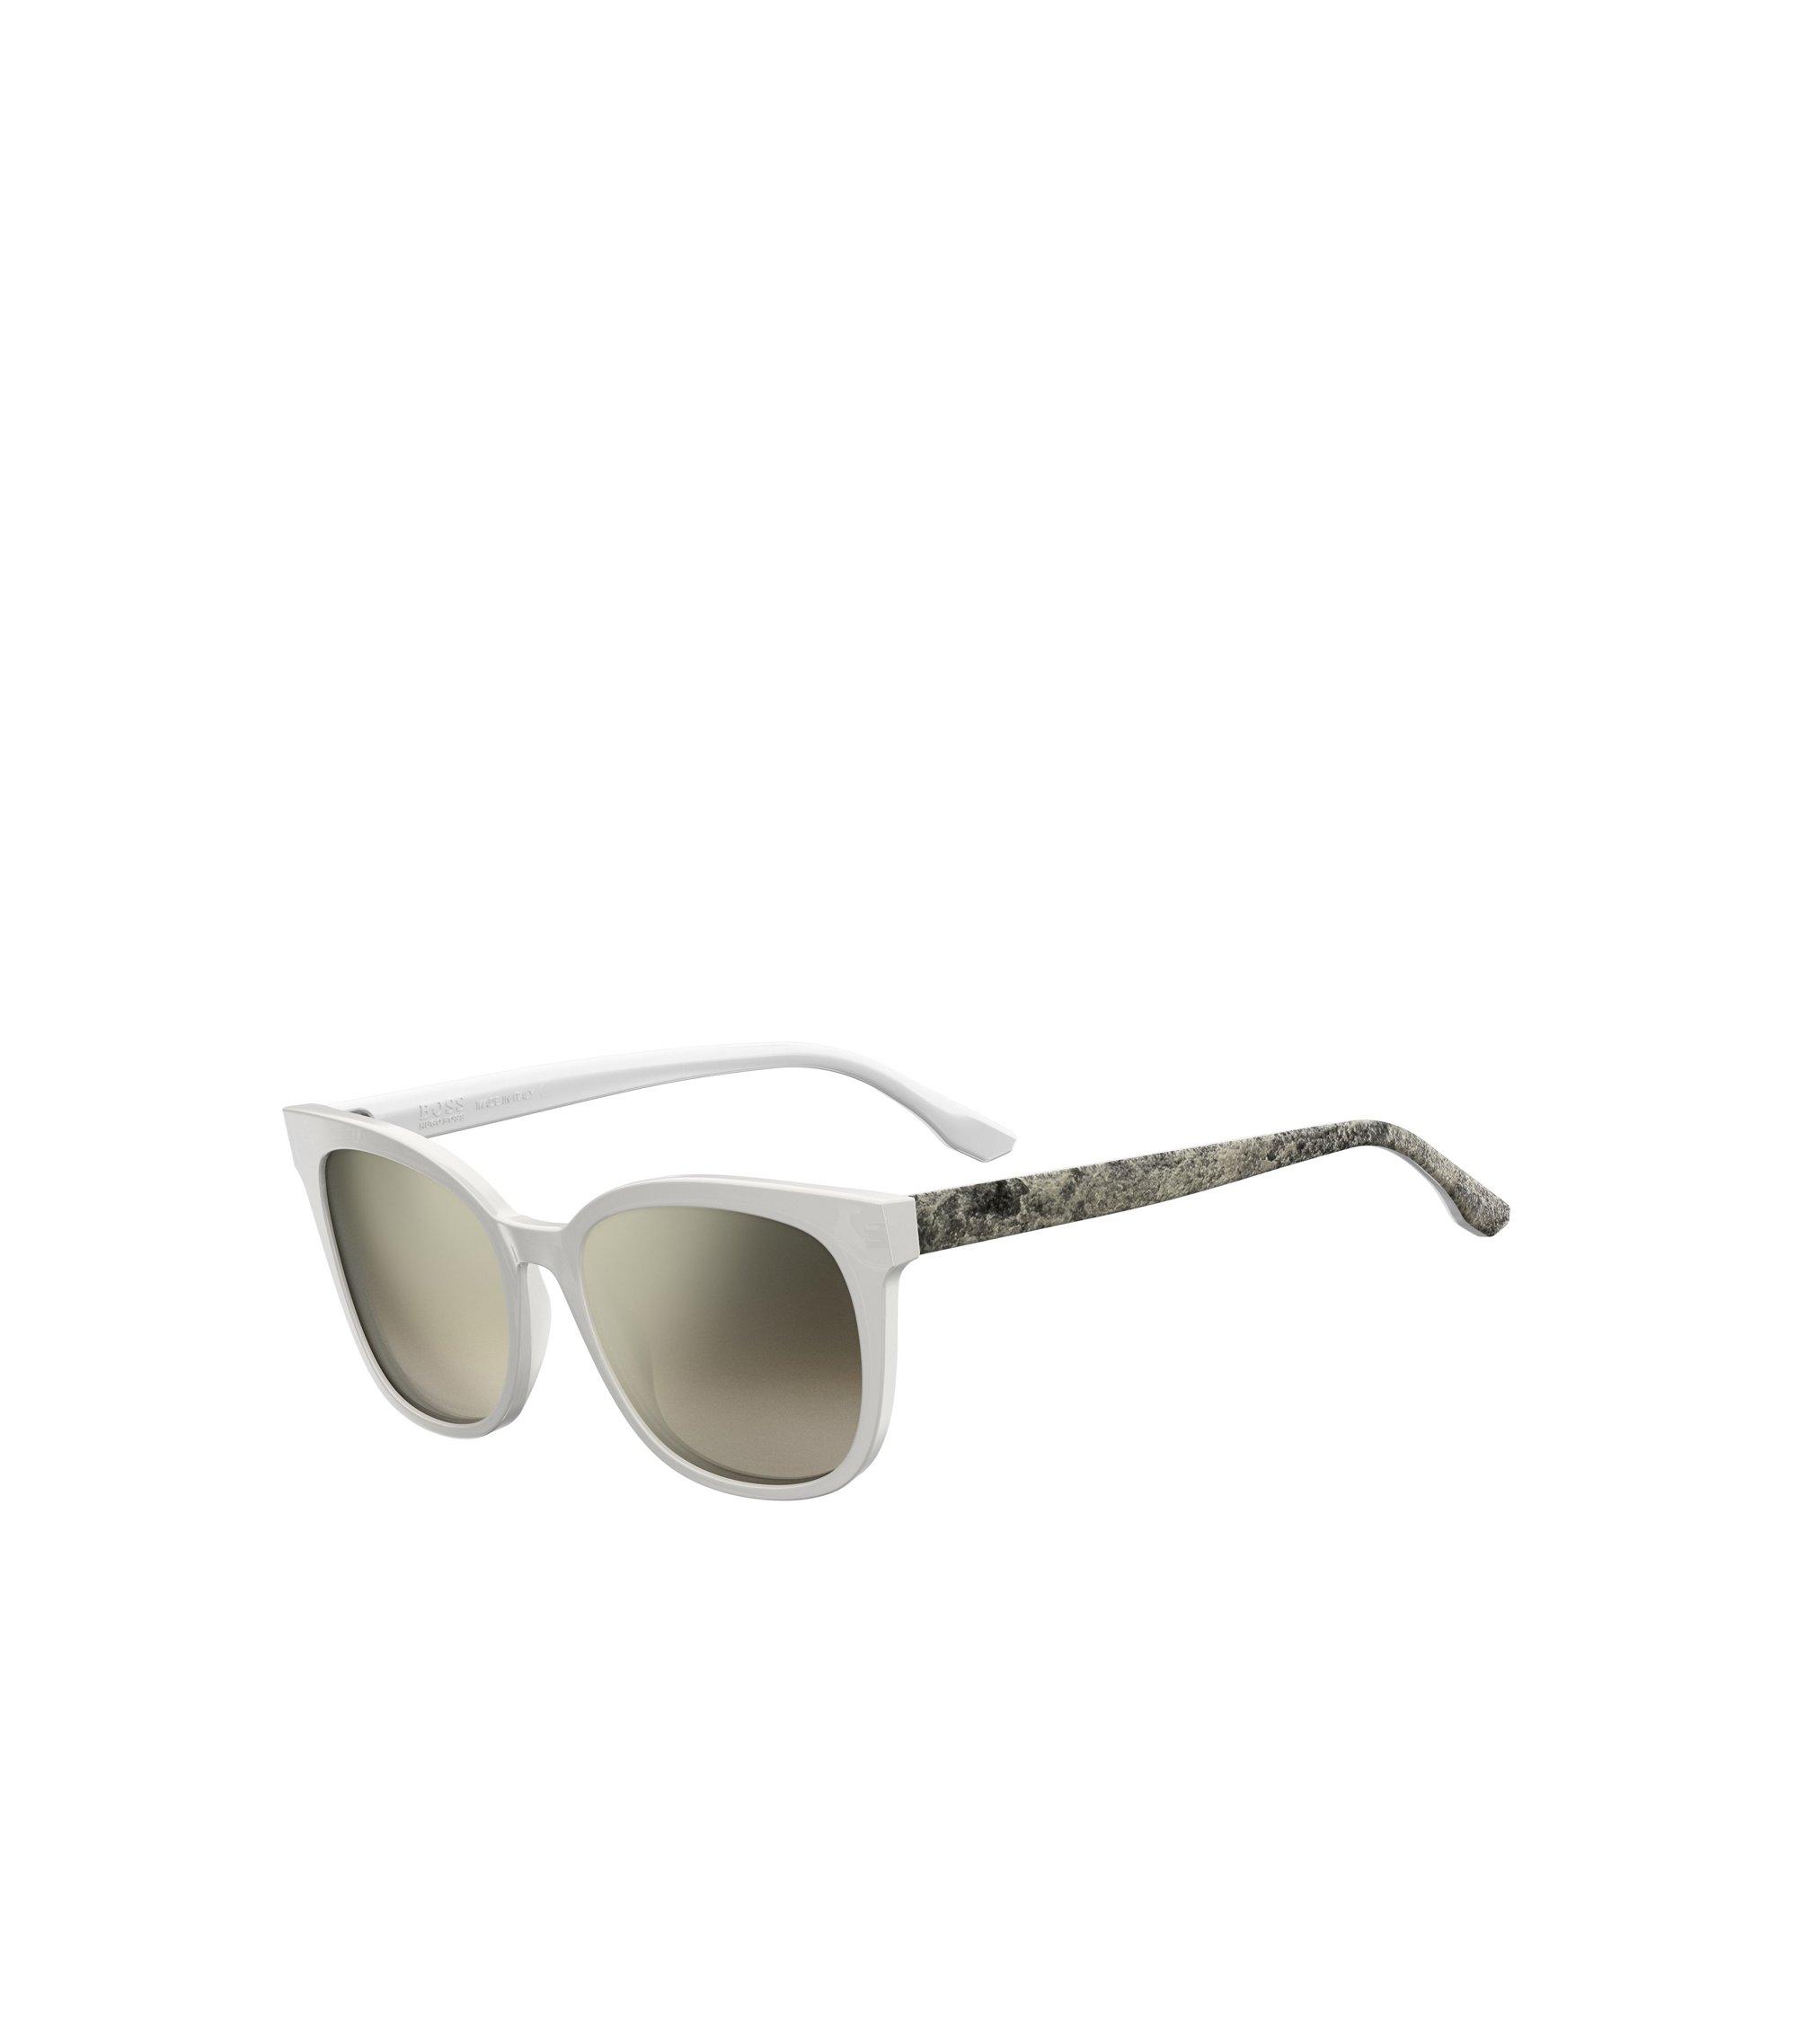 White Acetate Round Sunglasses | BOSS 0893, Assorted-Pre-Pack